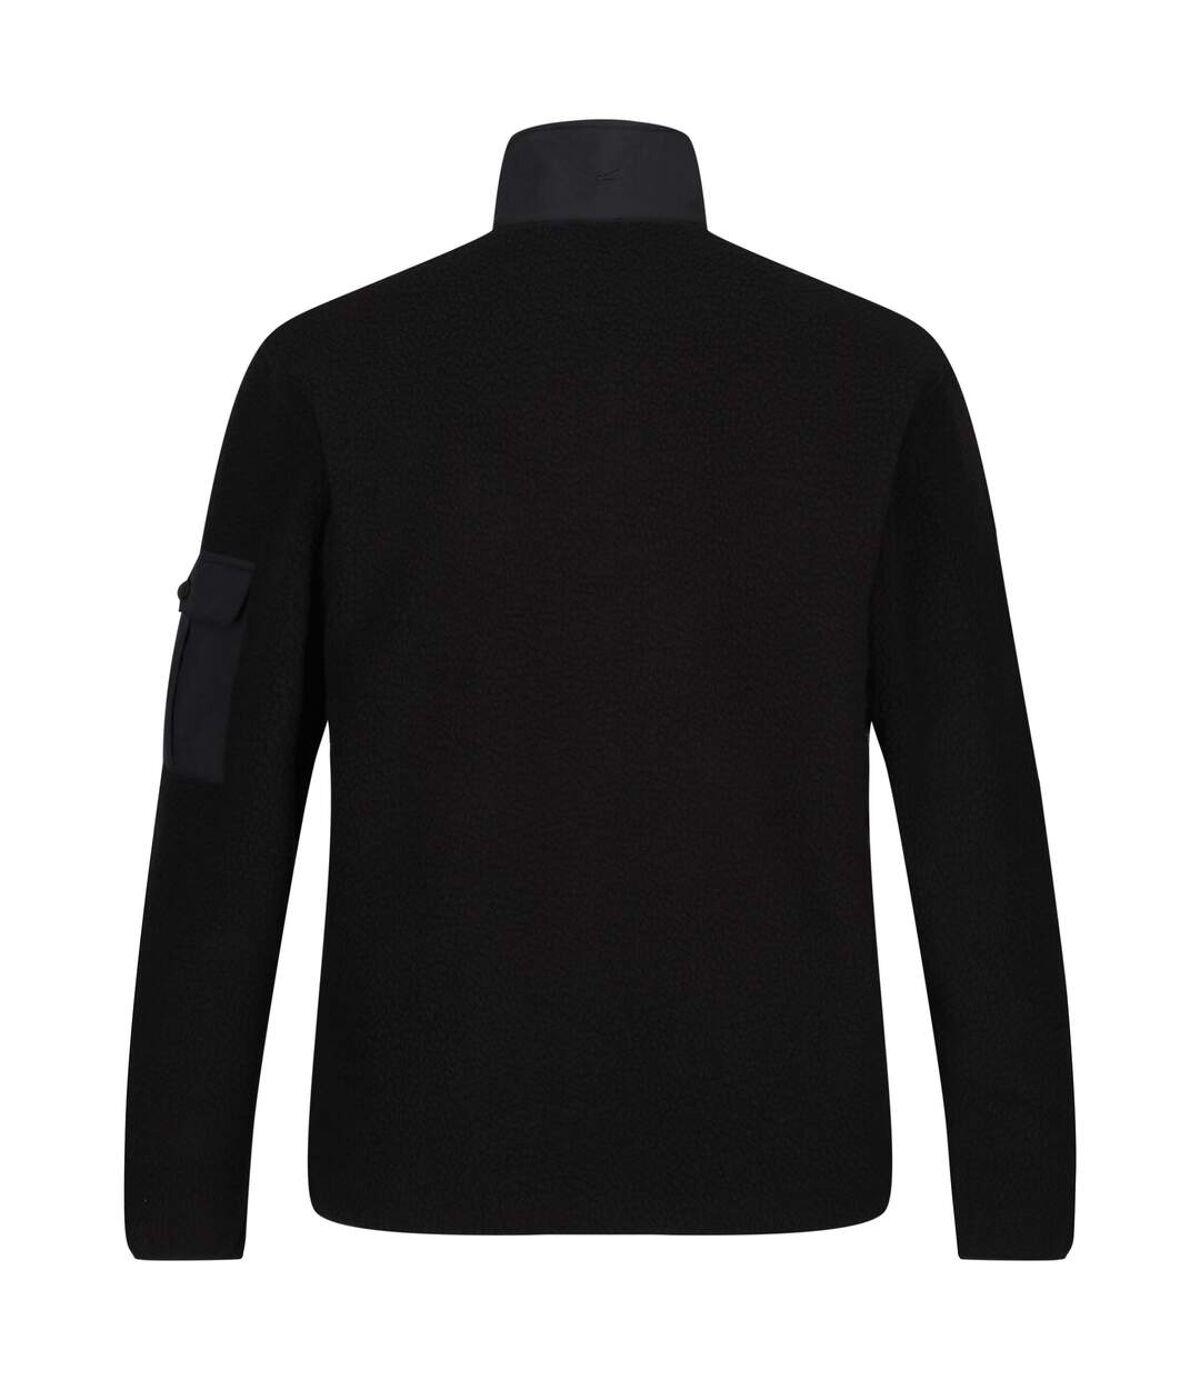 Regatta - Polaire CORMAC - Homme (Noir) - UTRG4600